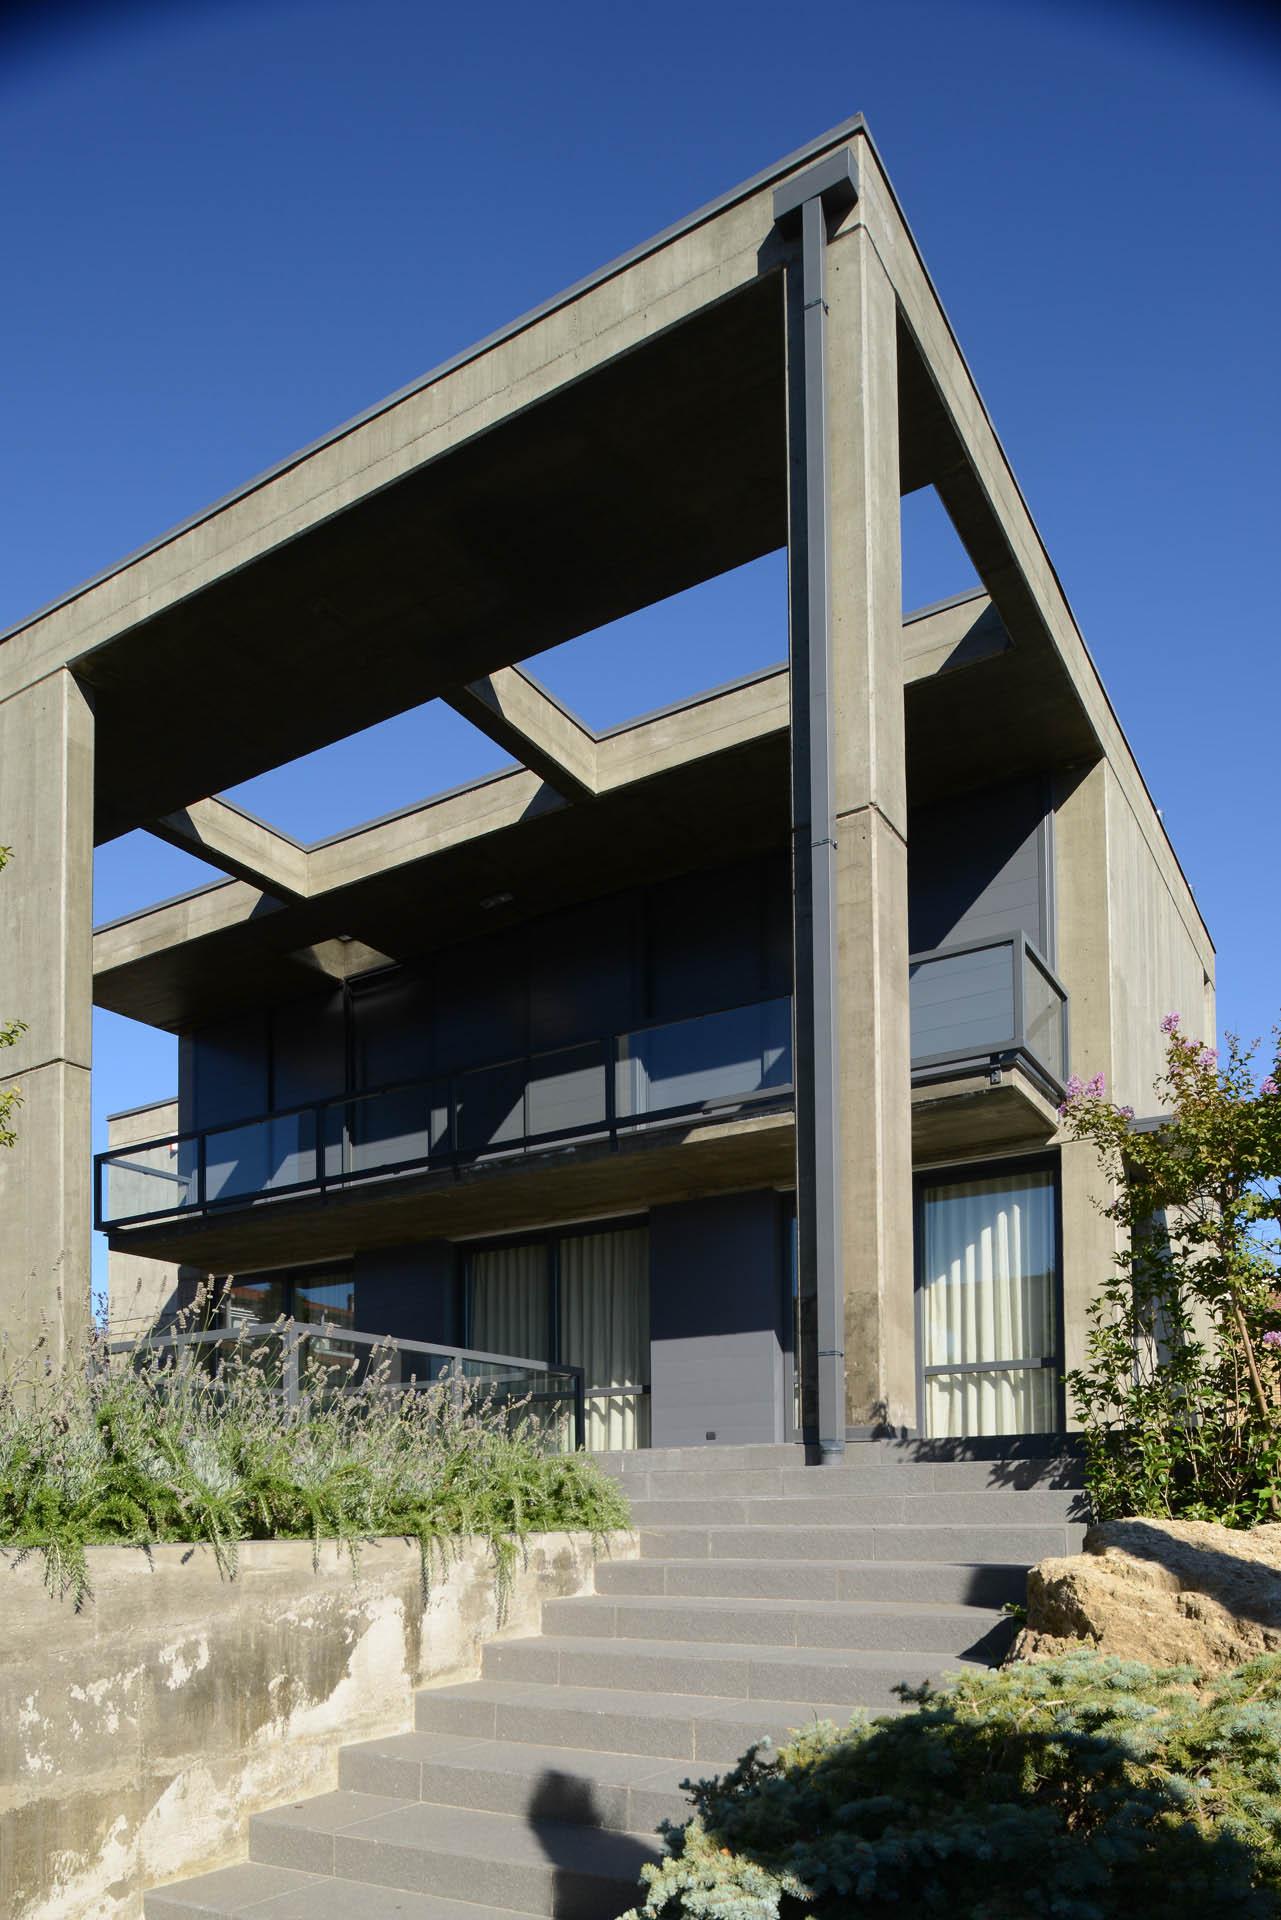 01 Studio Bacchi architetti associati casa 3 img 01